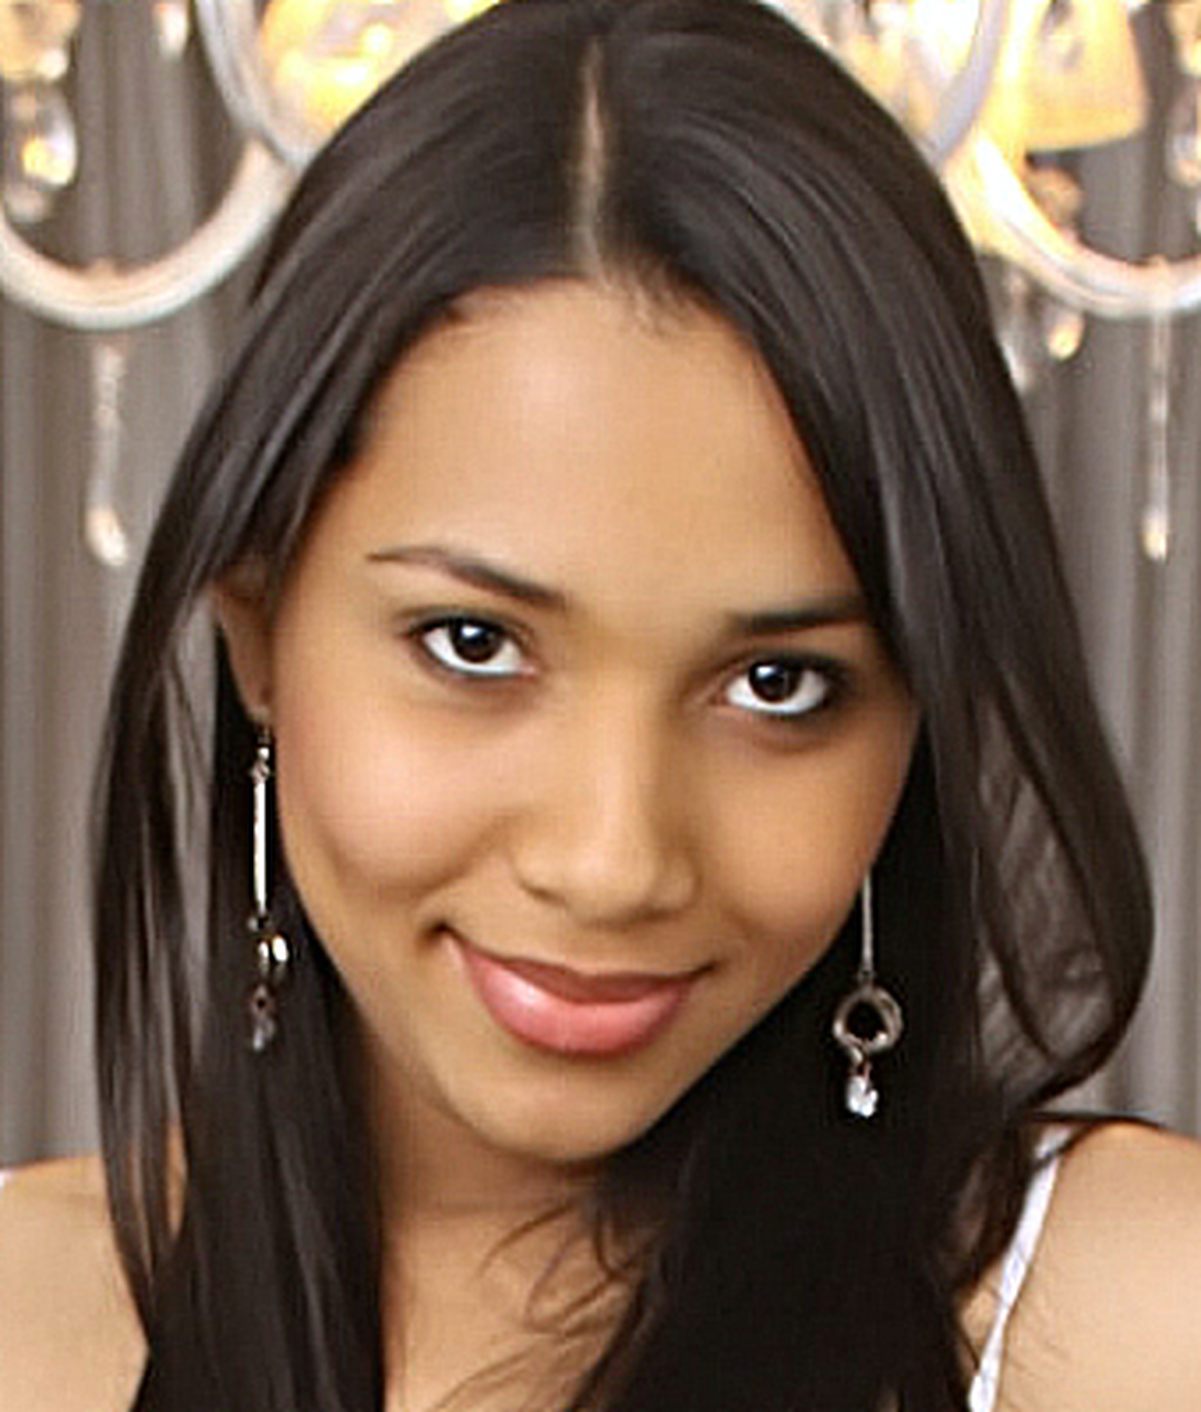 Camila Mattoli